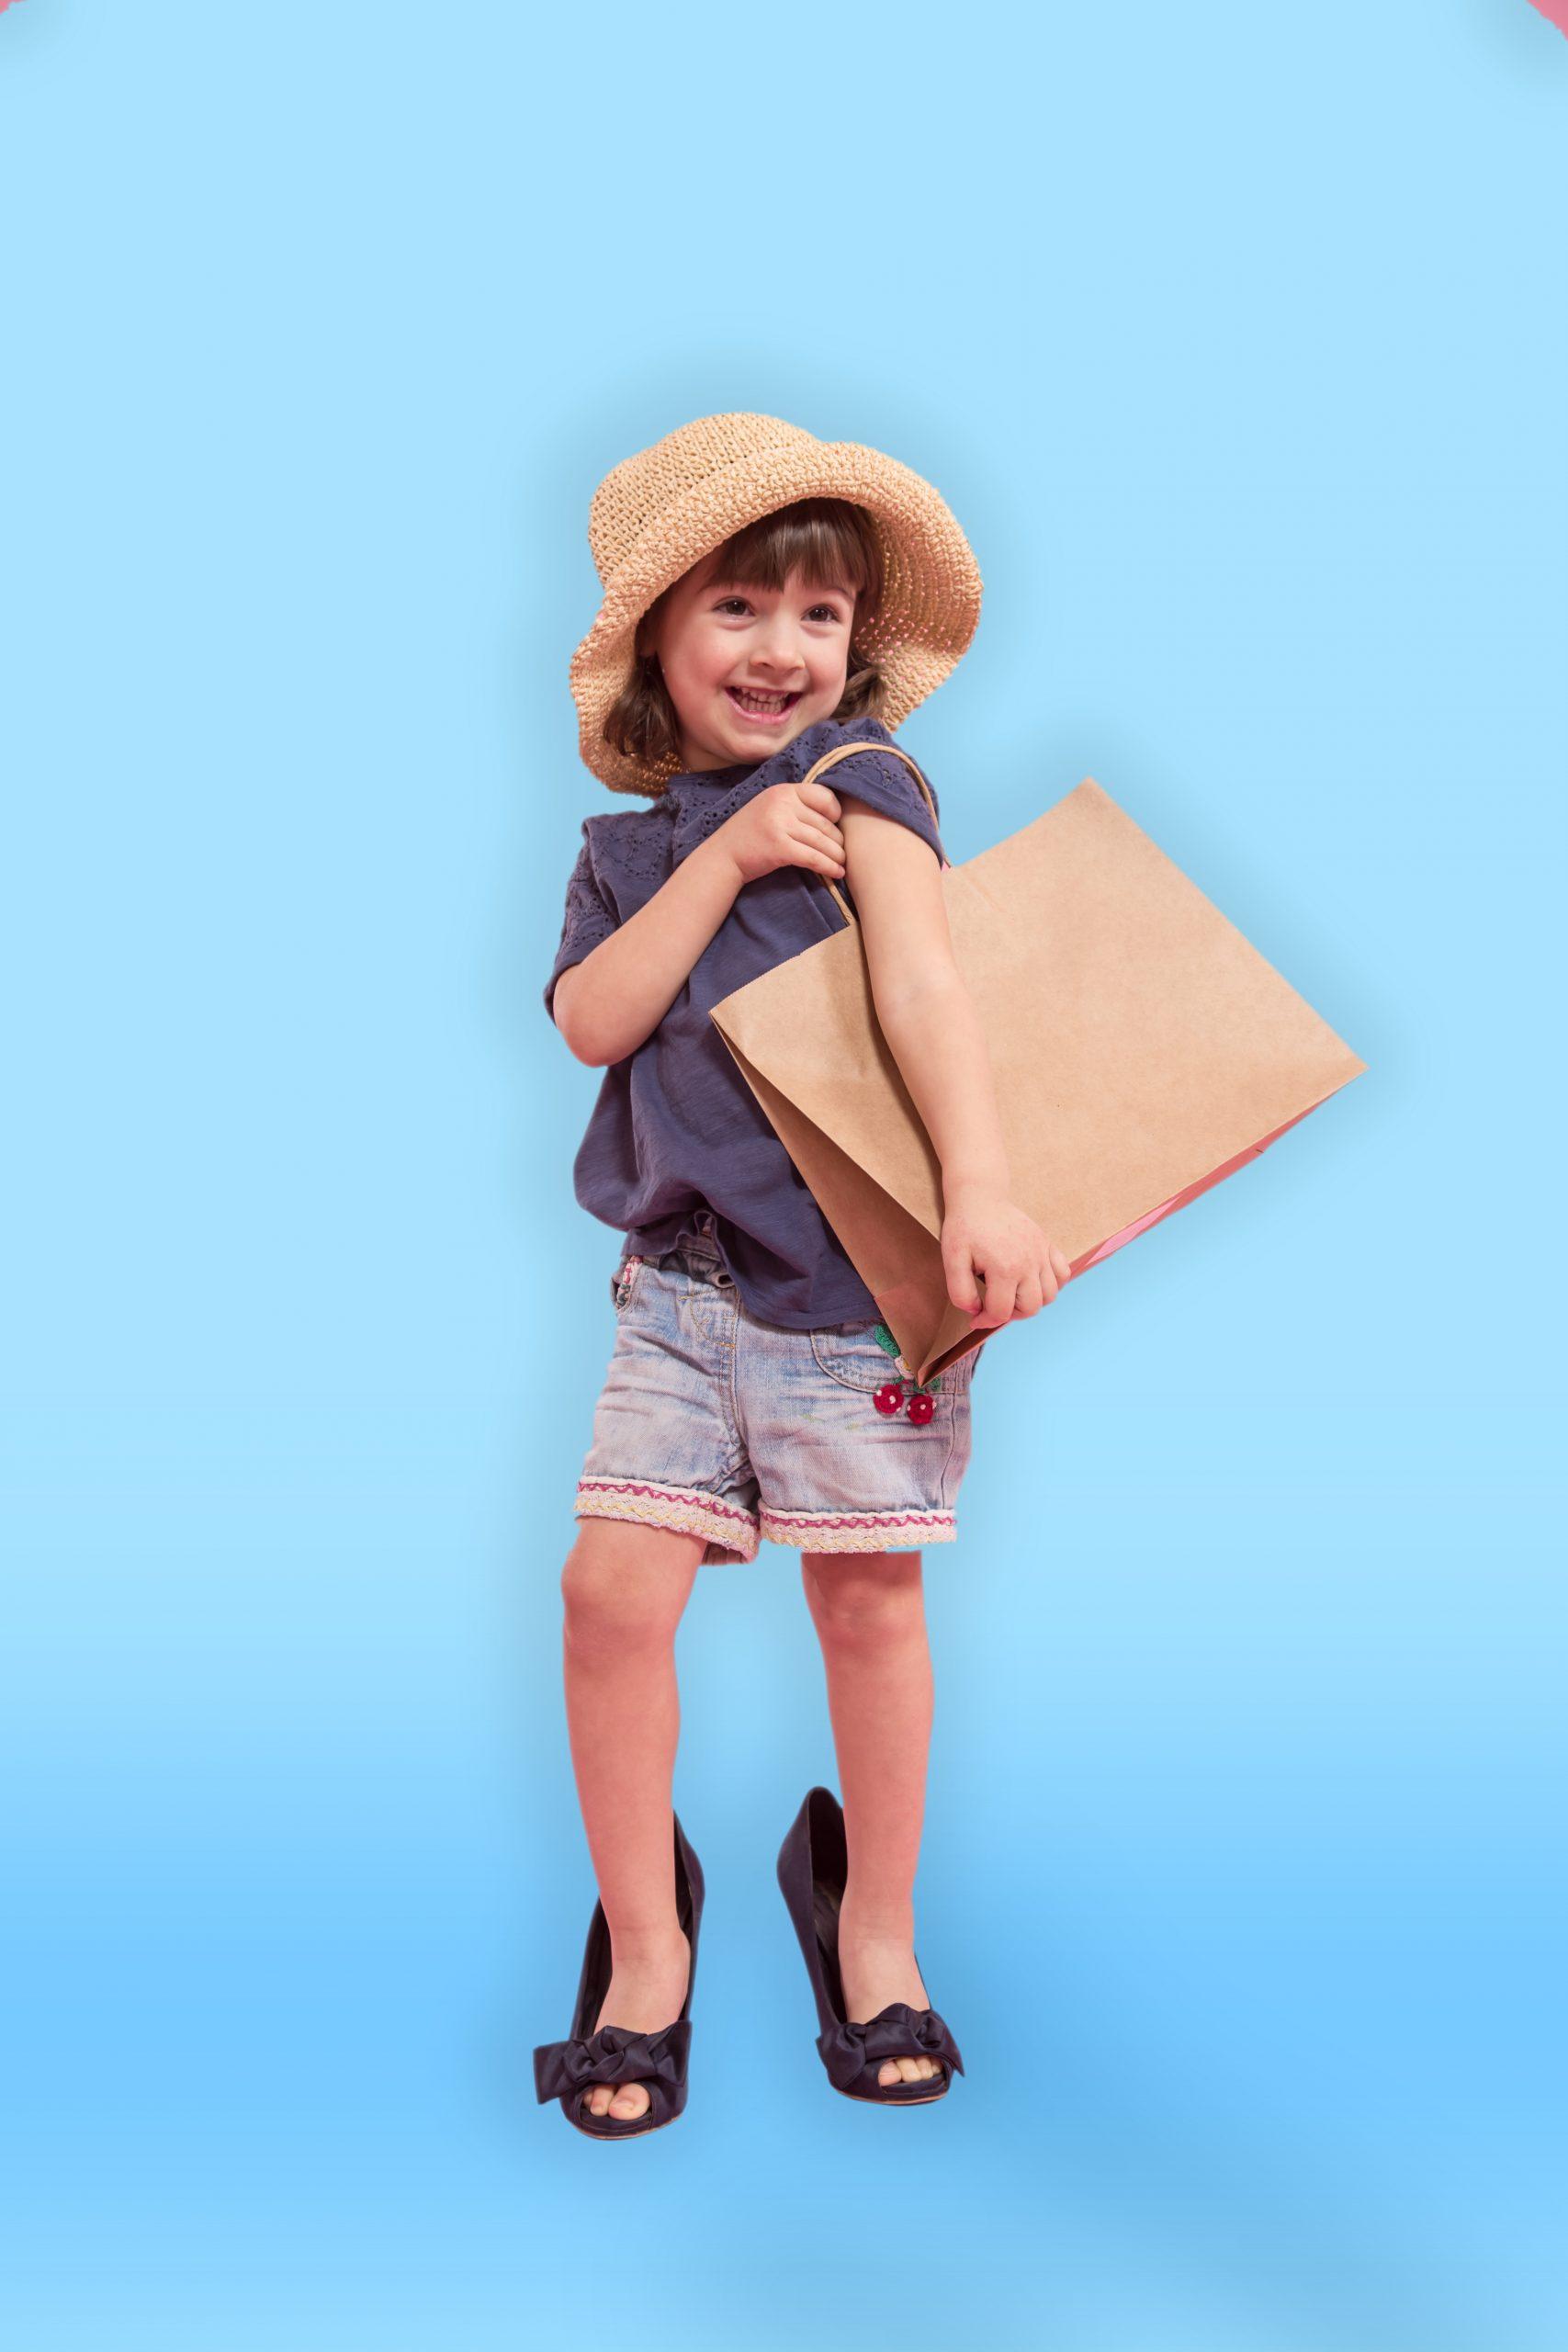 Girl dresses up as mum